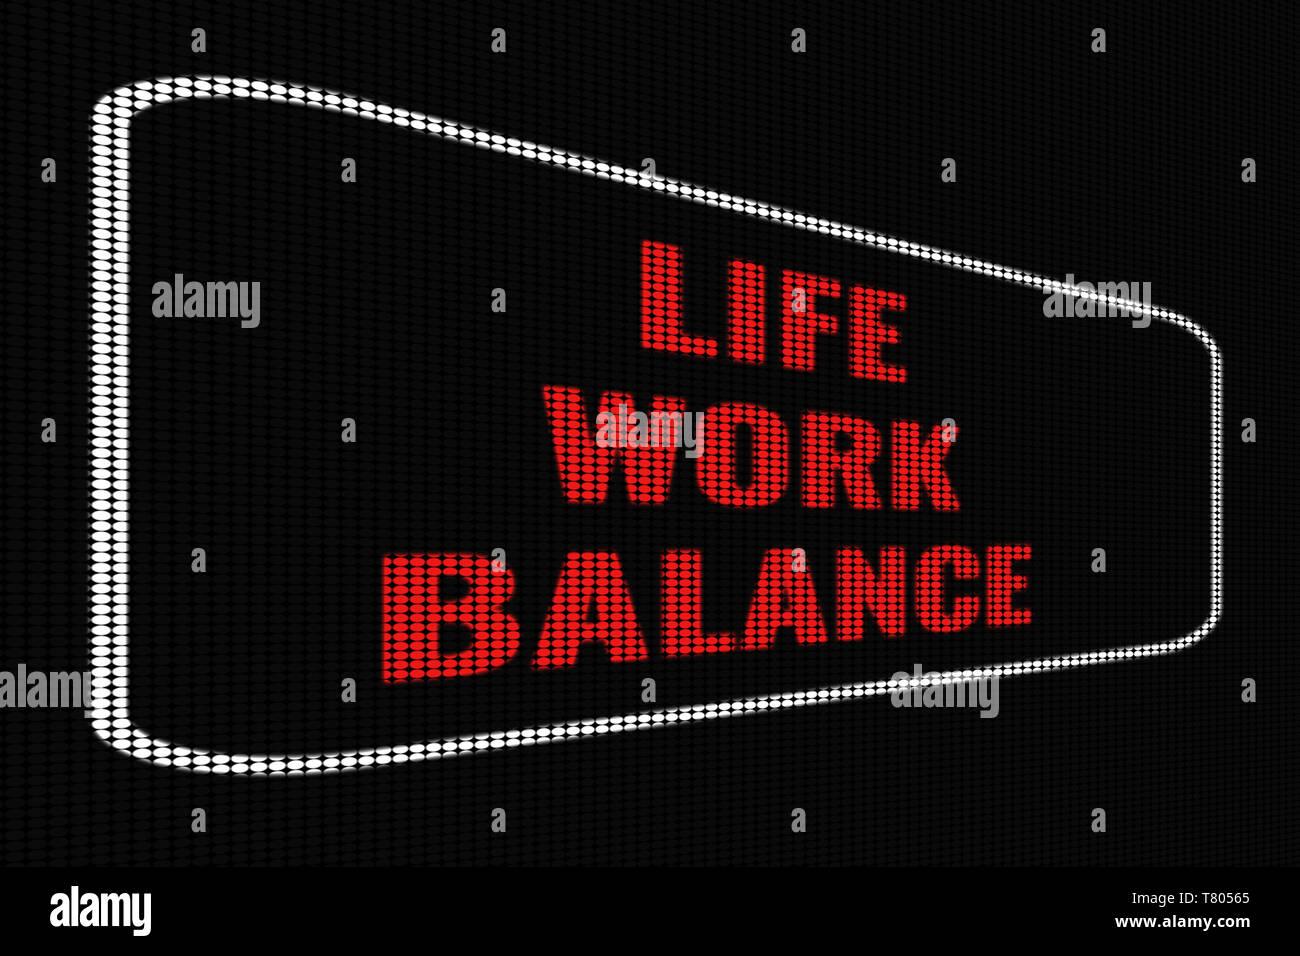 Life Work Balance red text on dark screen, tv effect. - Stock Image